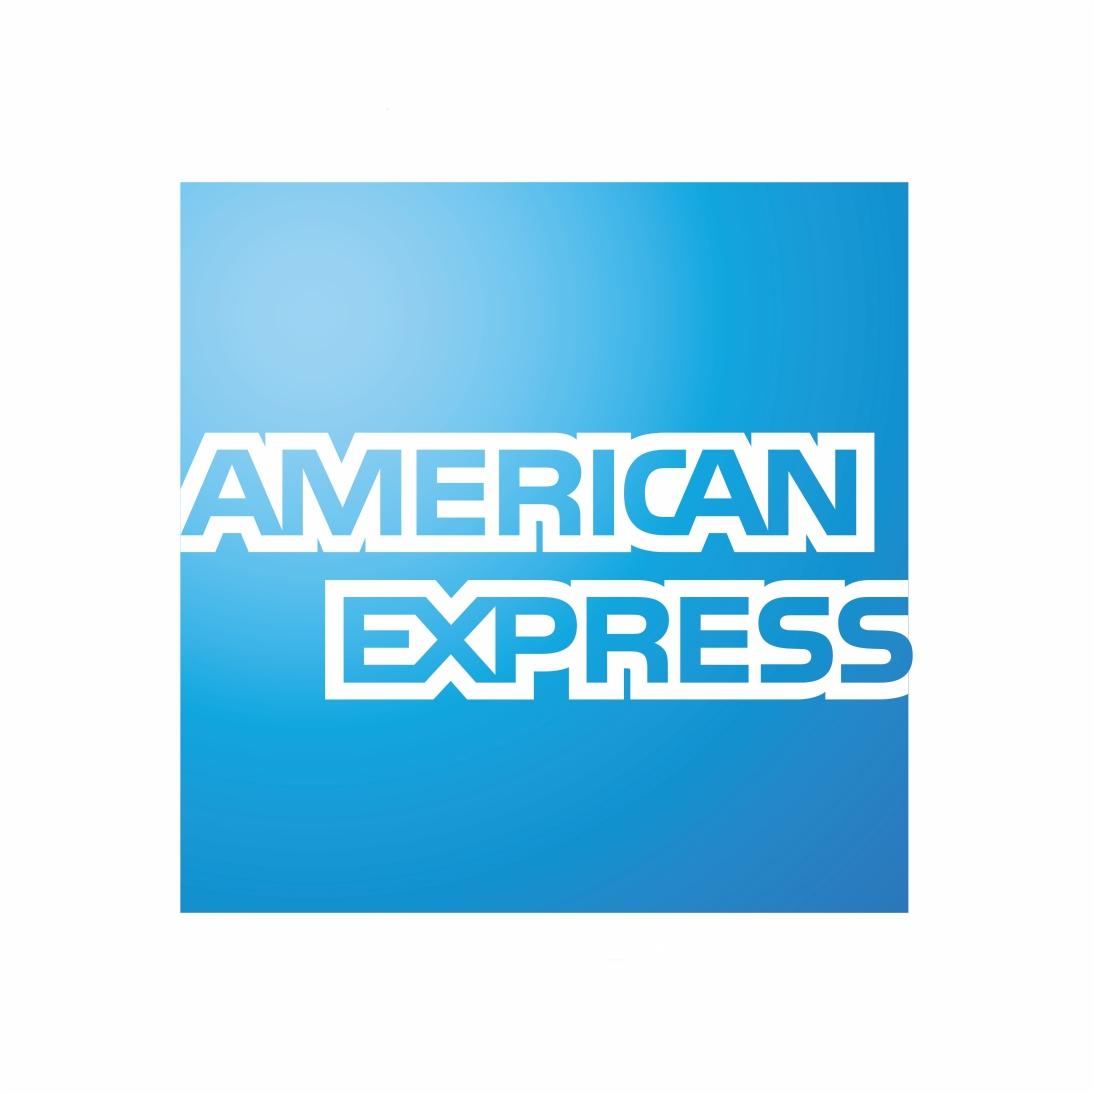 Americam Express